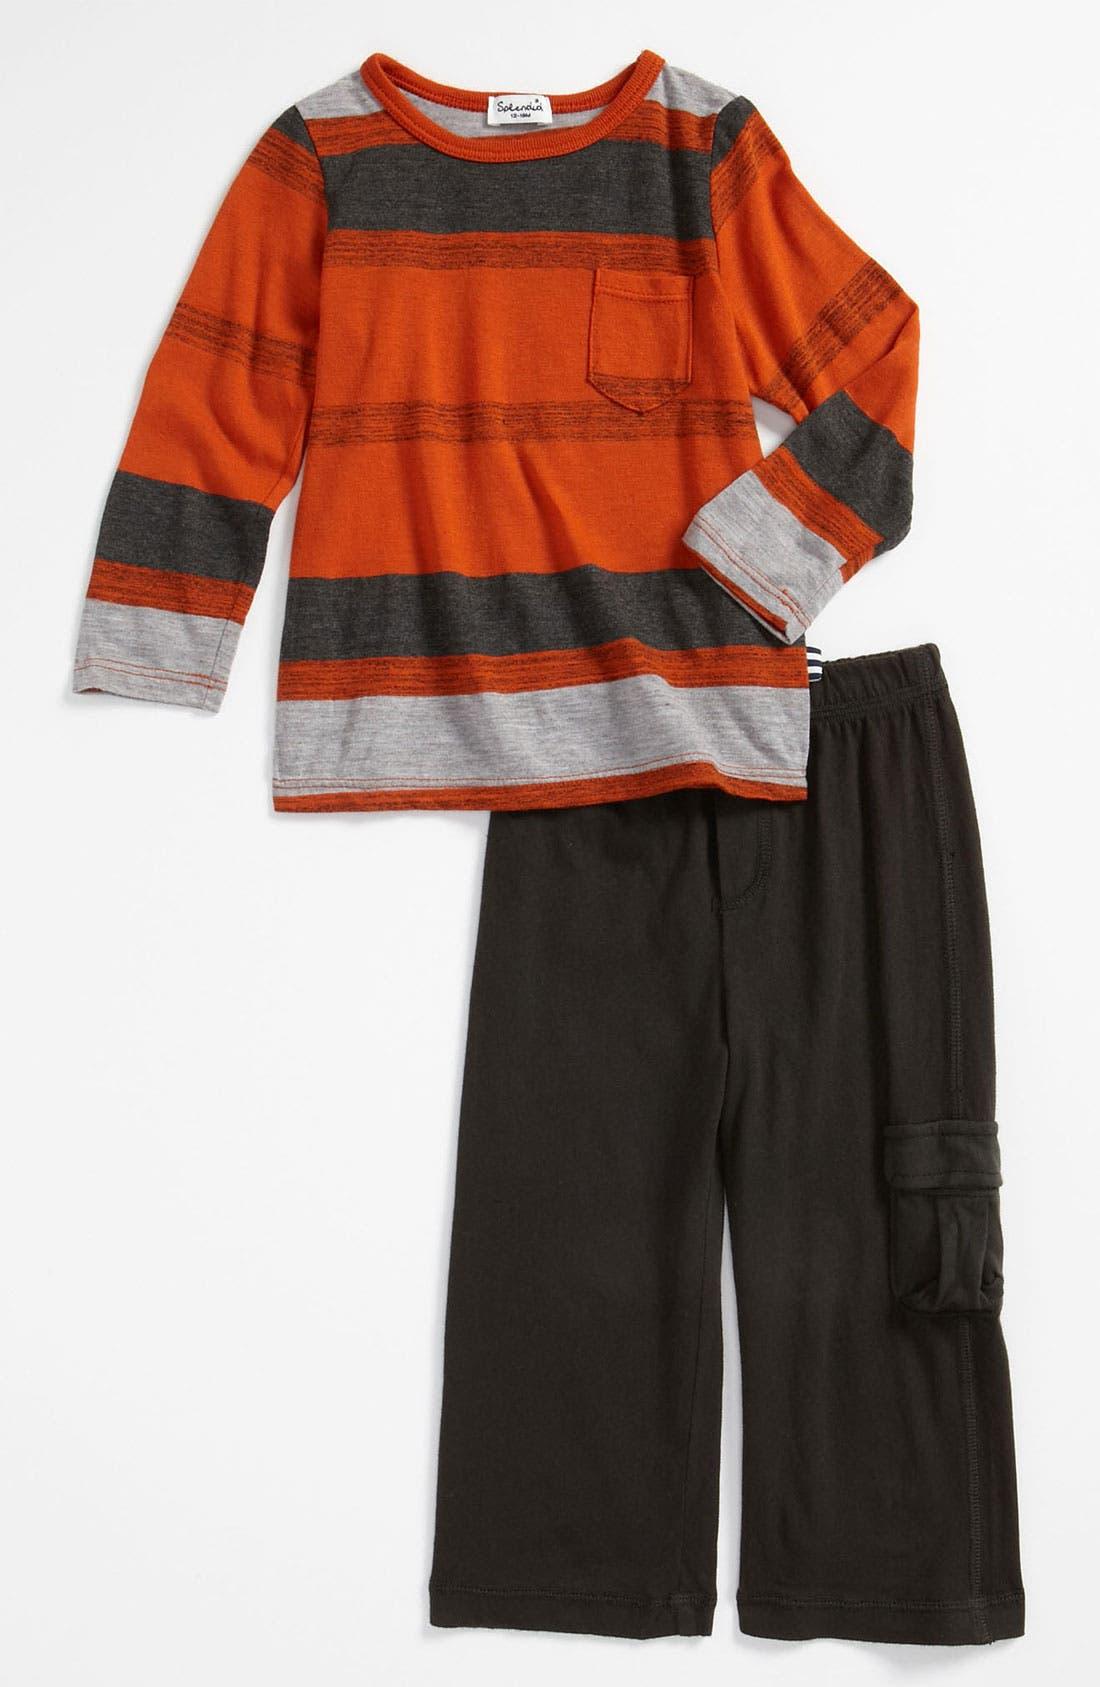 Main Image - Splendid 'Rustic Canyon Stripe' T-Shirt & Leggings (Infant)